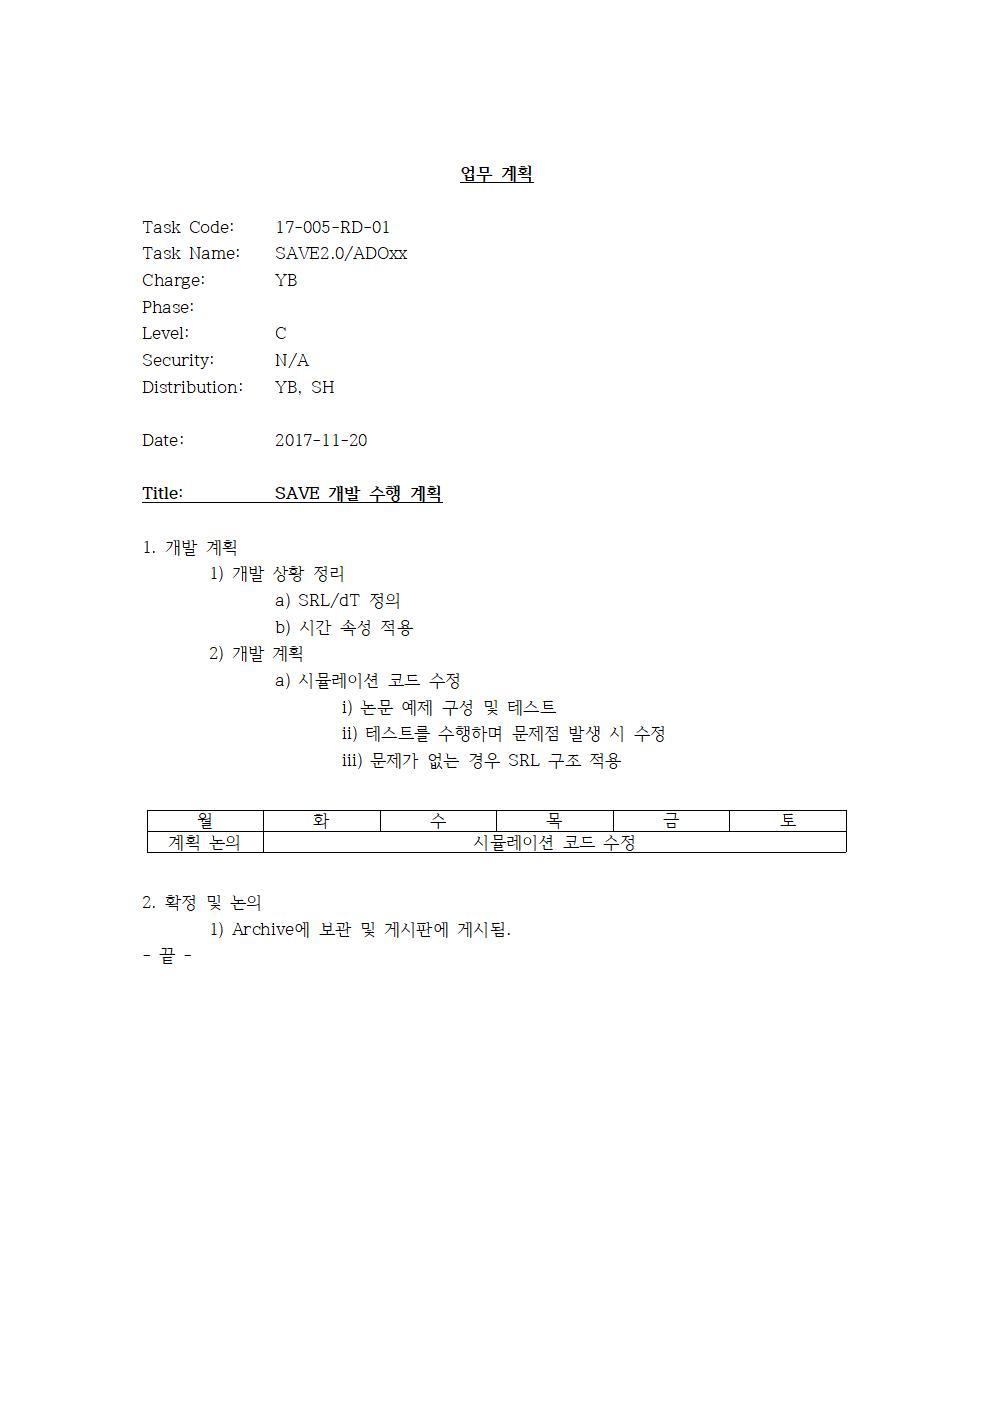 D-[17-005-RD-01]-[SAVE 2.0 ADOxx]-[YB]-[2017-11-20]001.jpg